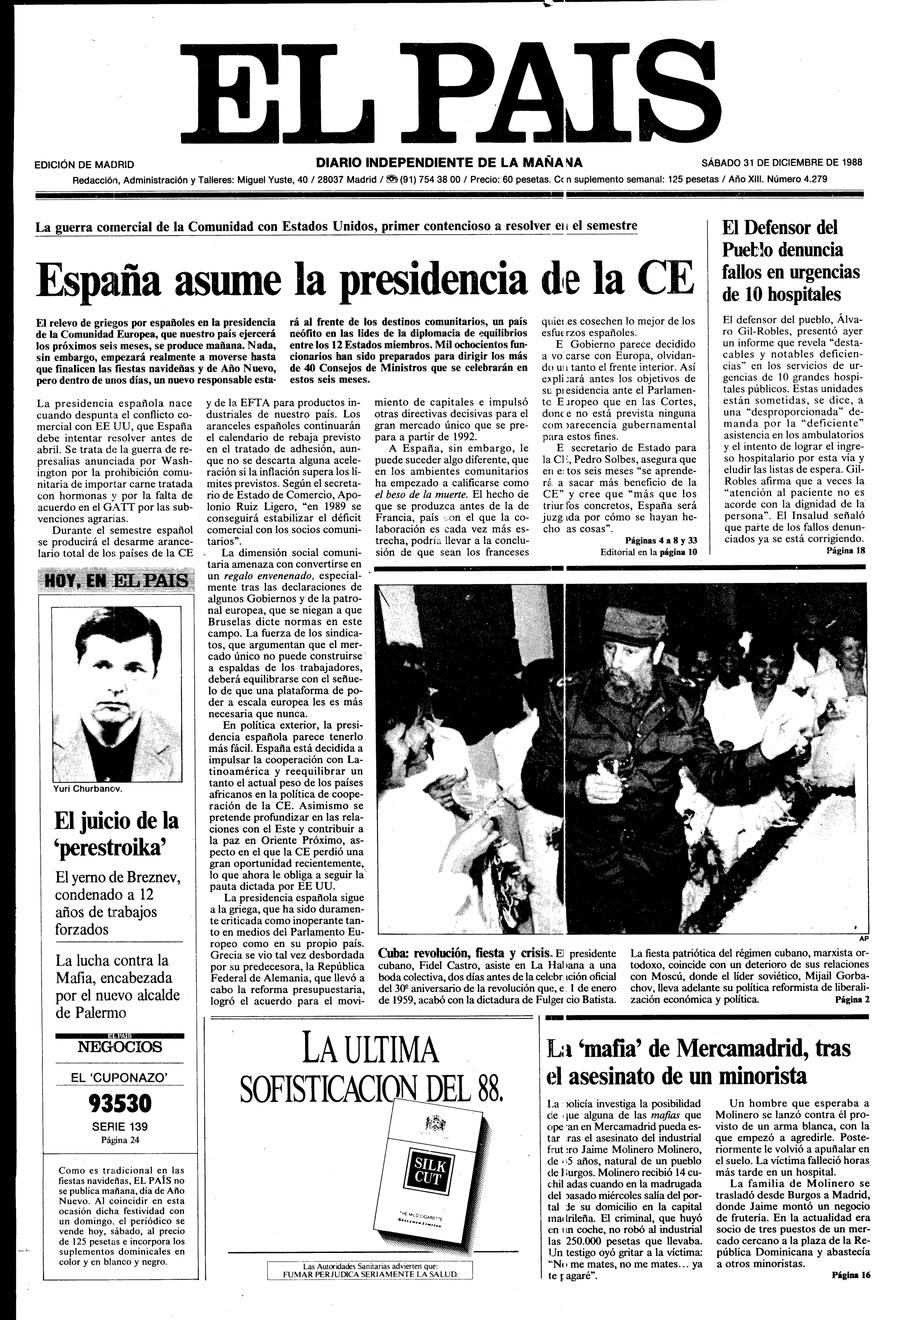 31 de Diciembre de 1988